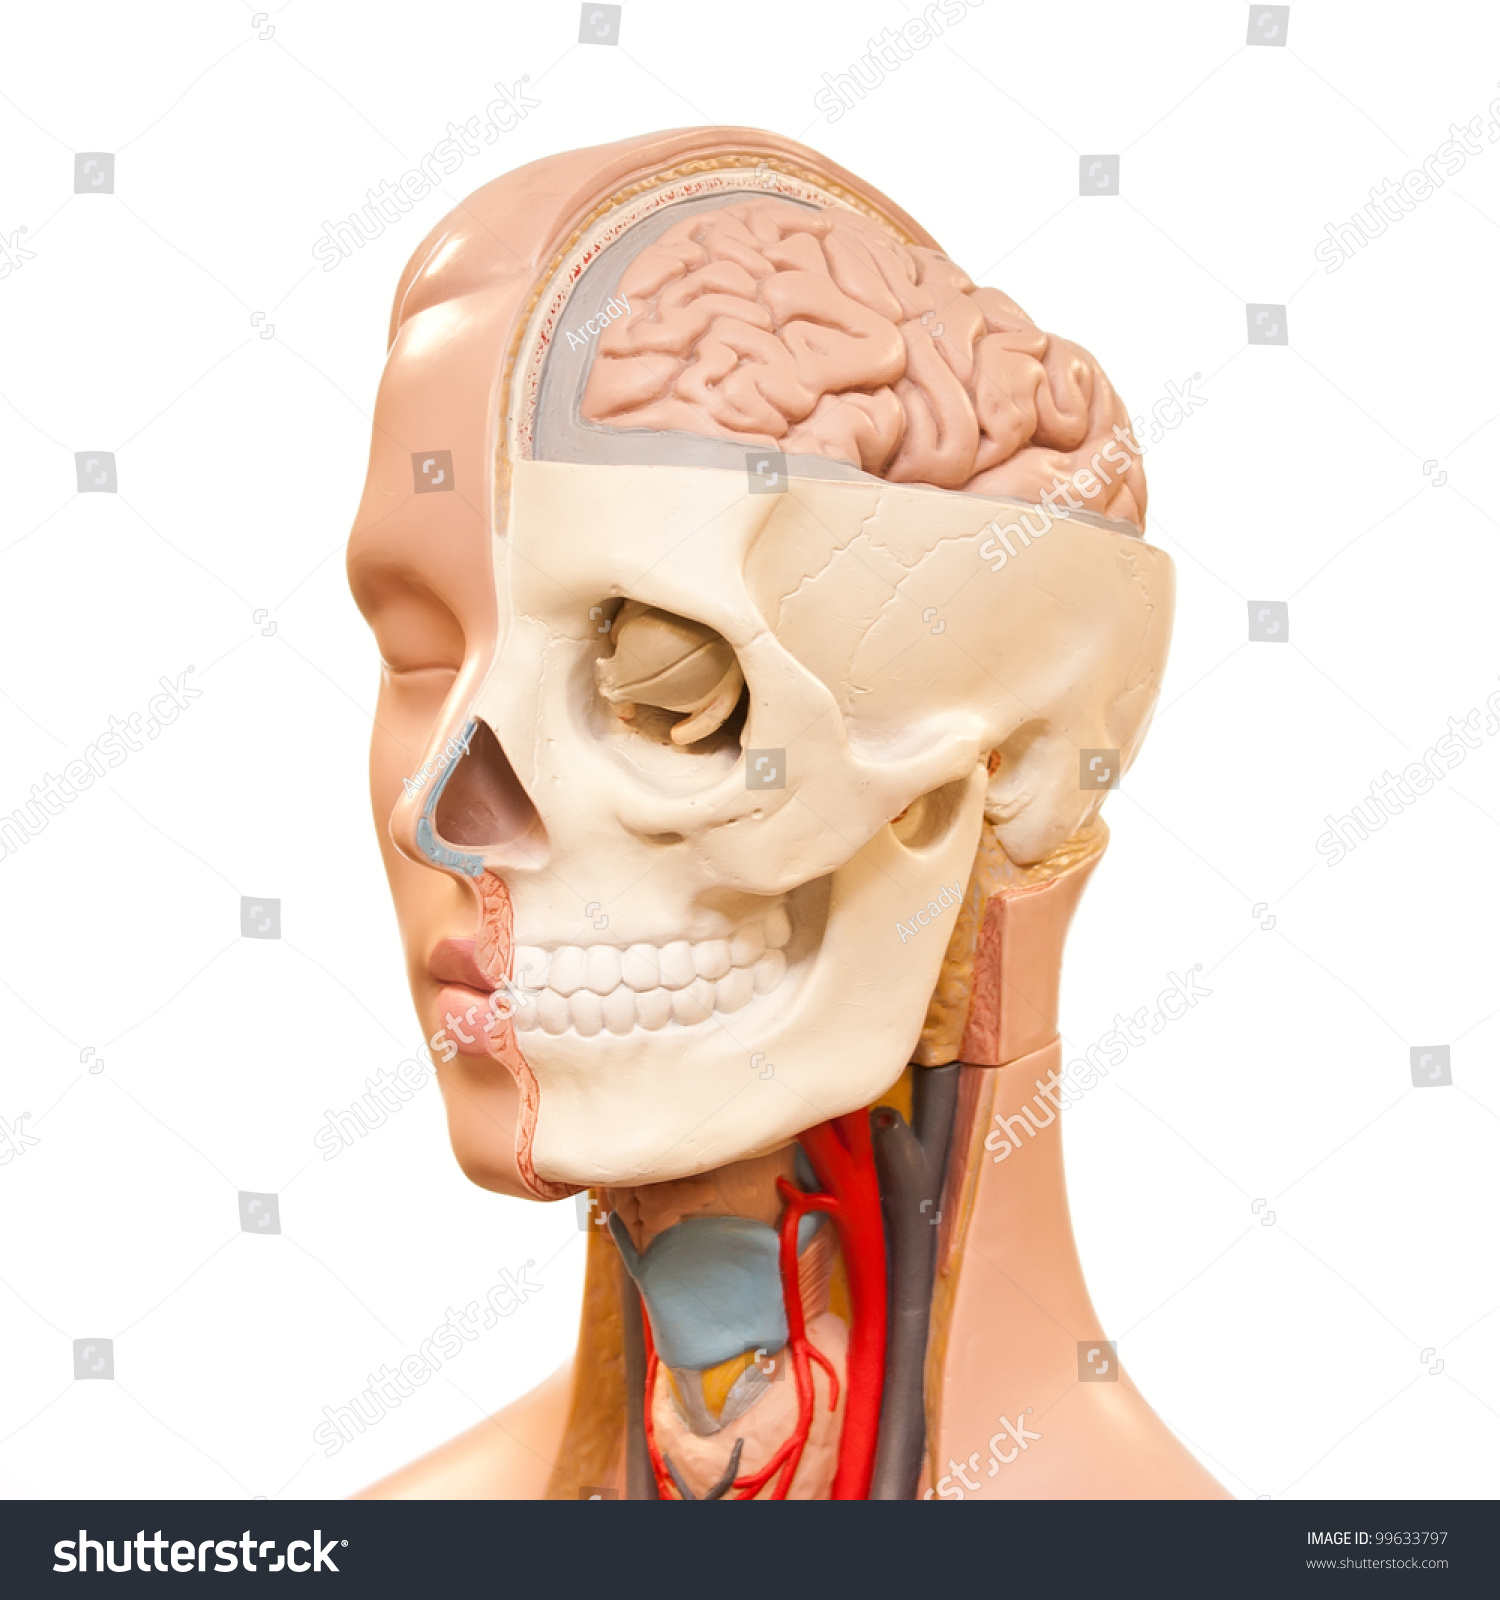 Human Head Anatomy Picture Stock Photo Edit Now 99633797